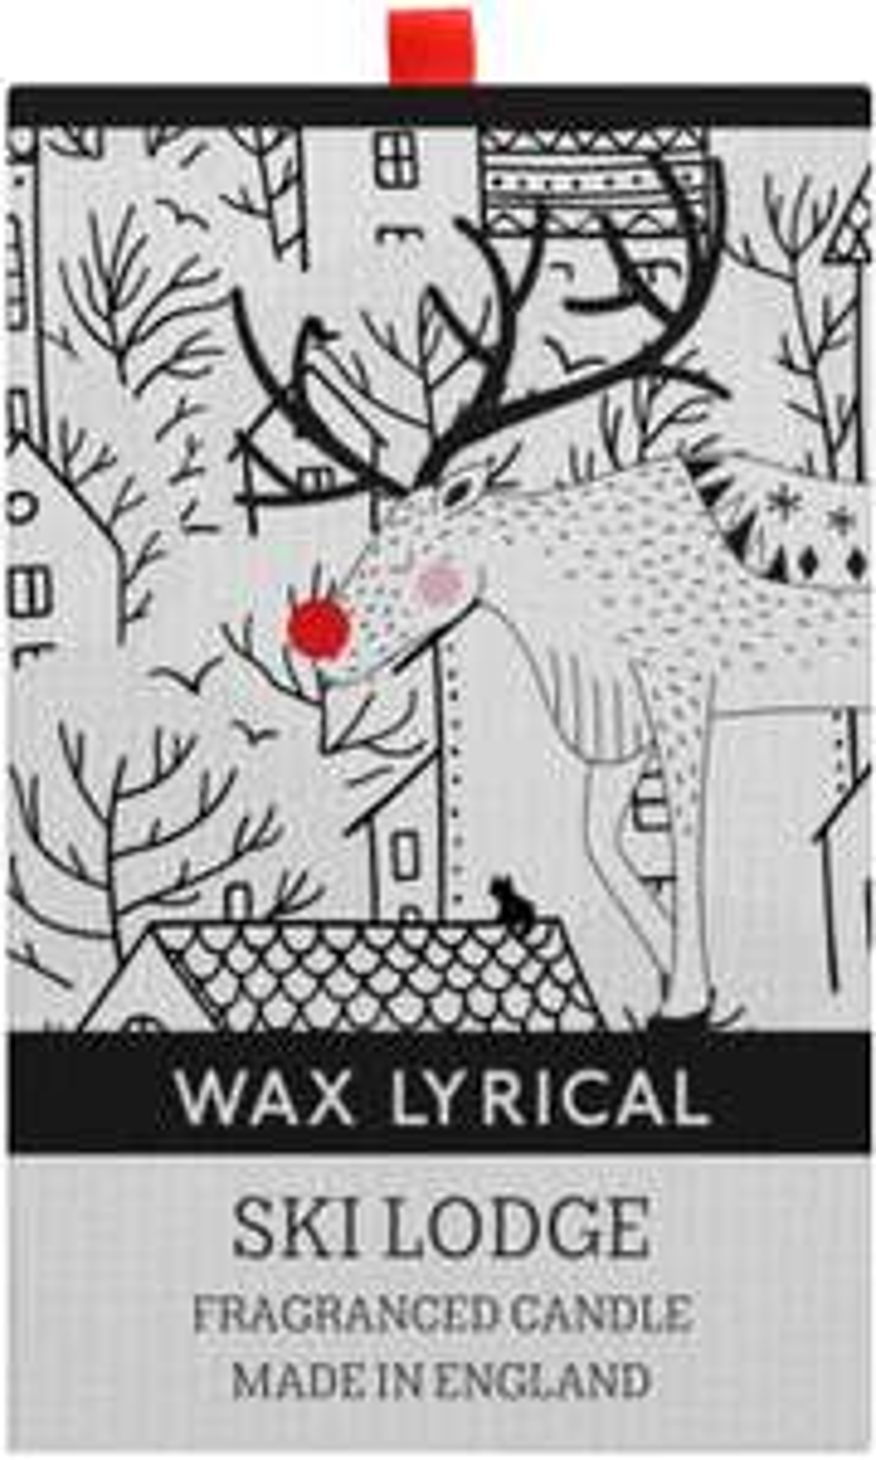 Wax Lyrical Ski Lodge Candle, Up To 50 Hours Burn Time, 11cm x 11cm x 15cm - £12.99 Prime / +£4.49 non Prime @ Amazon